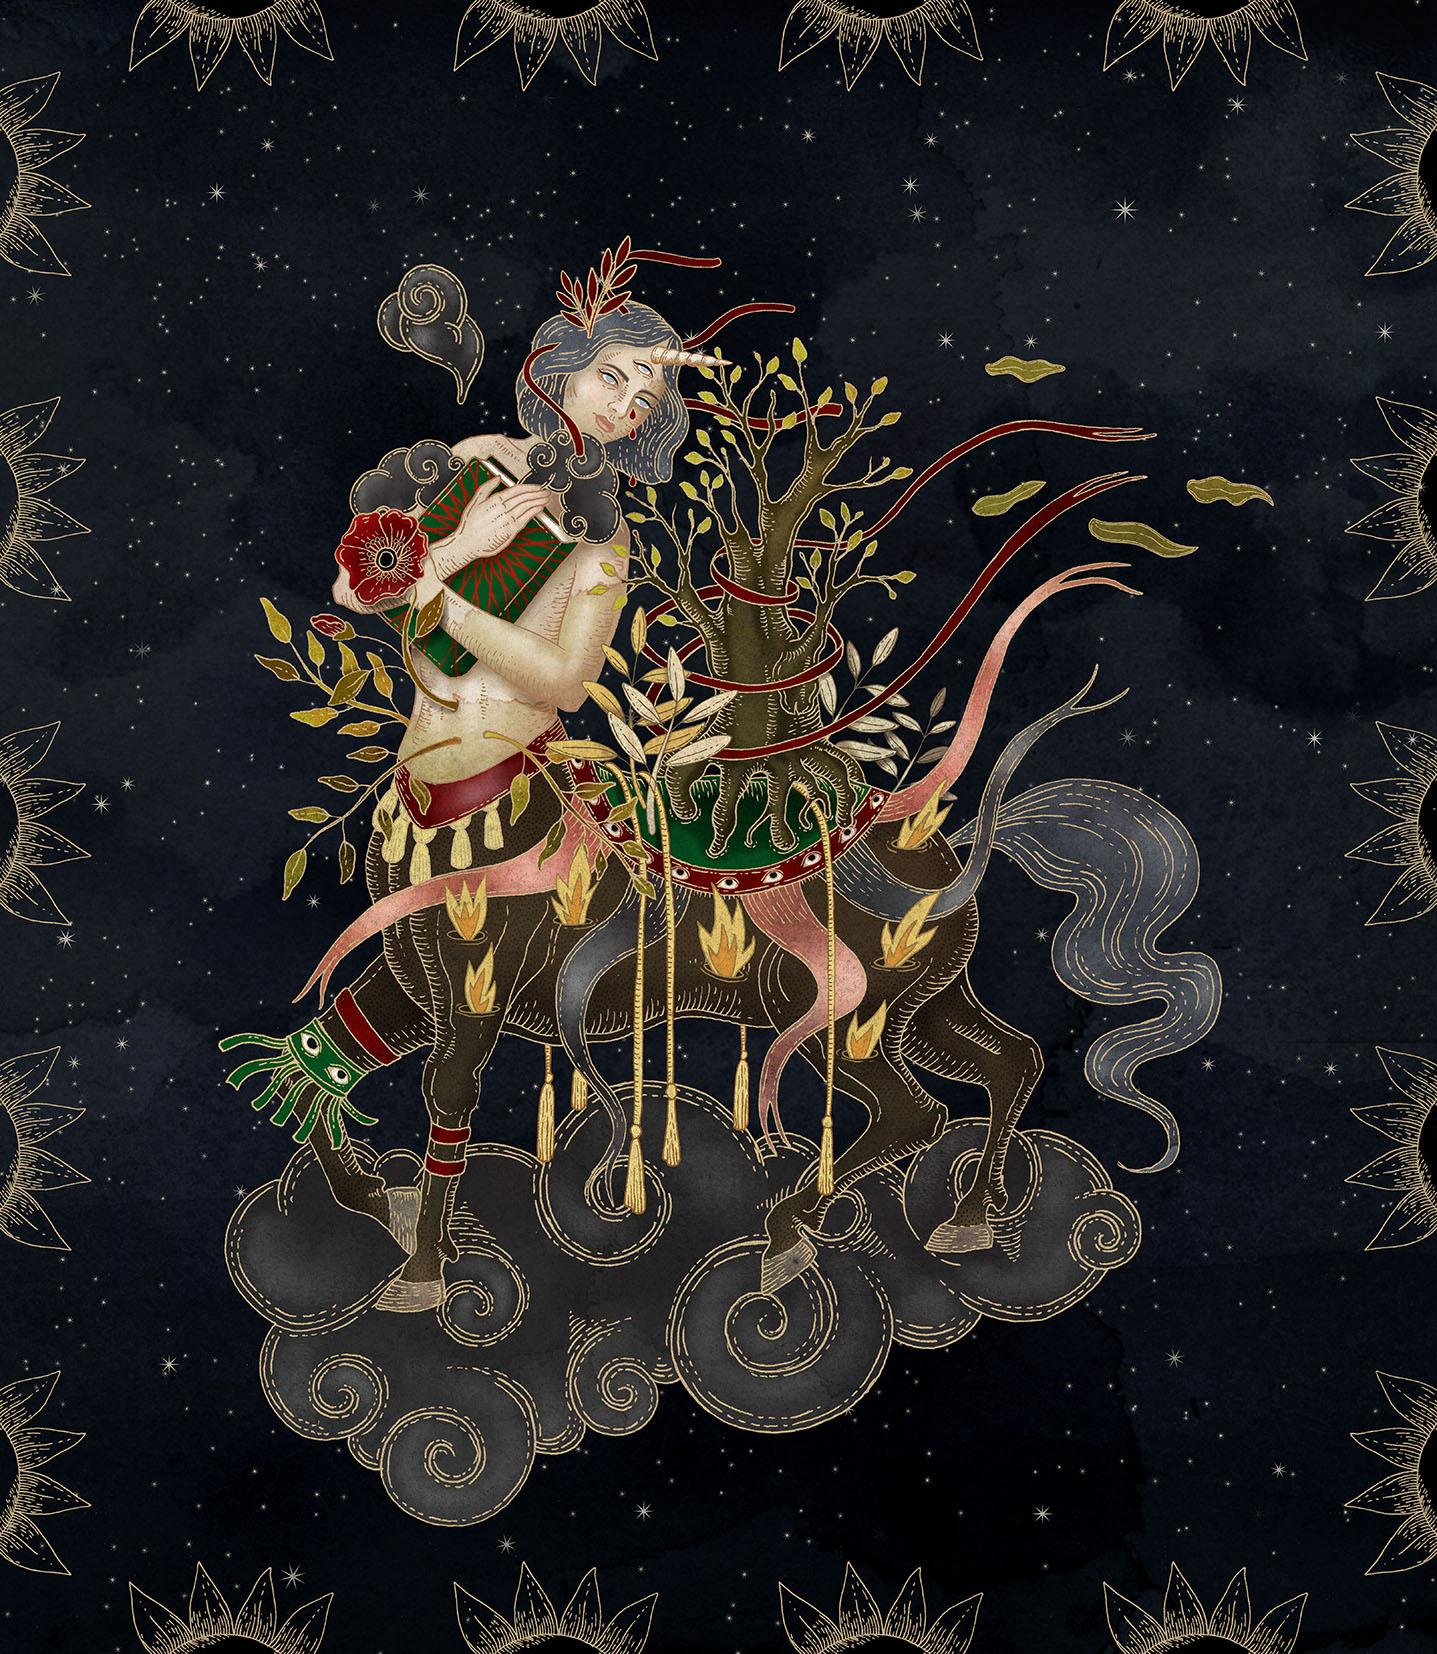 ale-de-la-torre-centauress-3.jpg